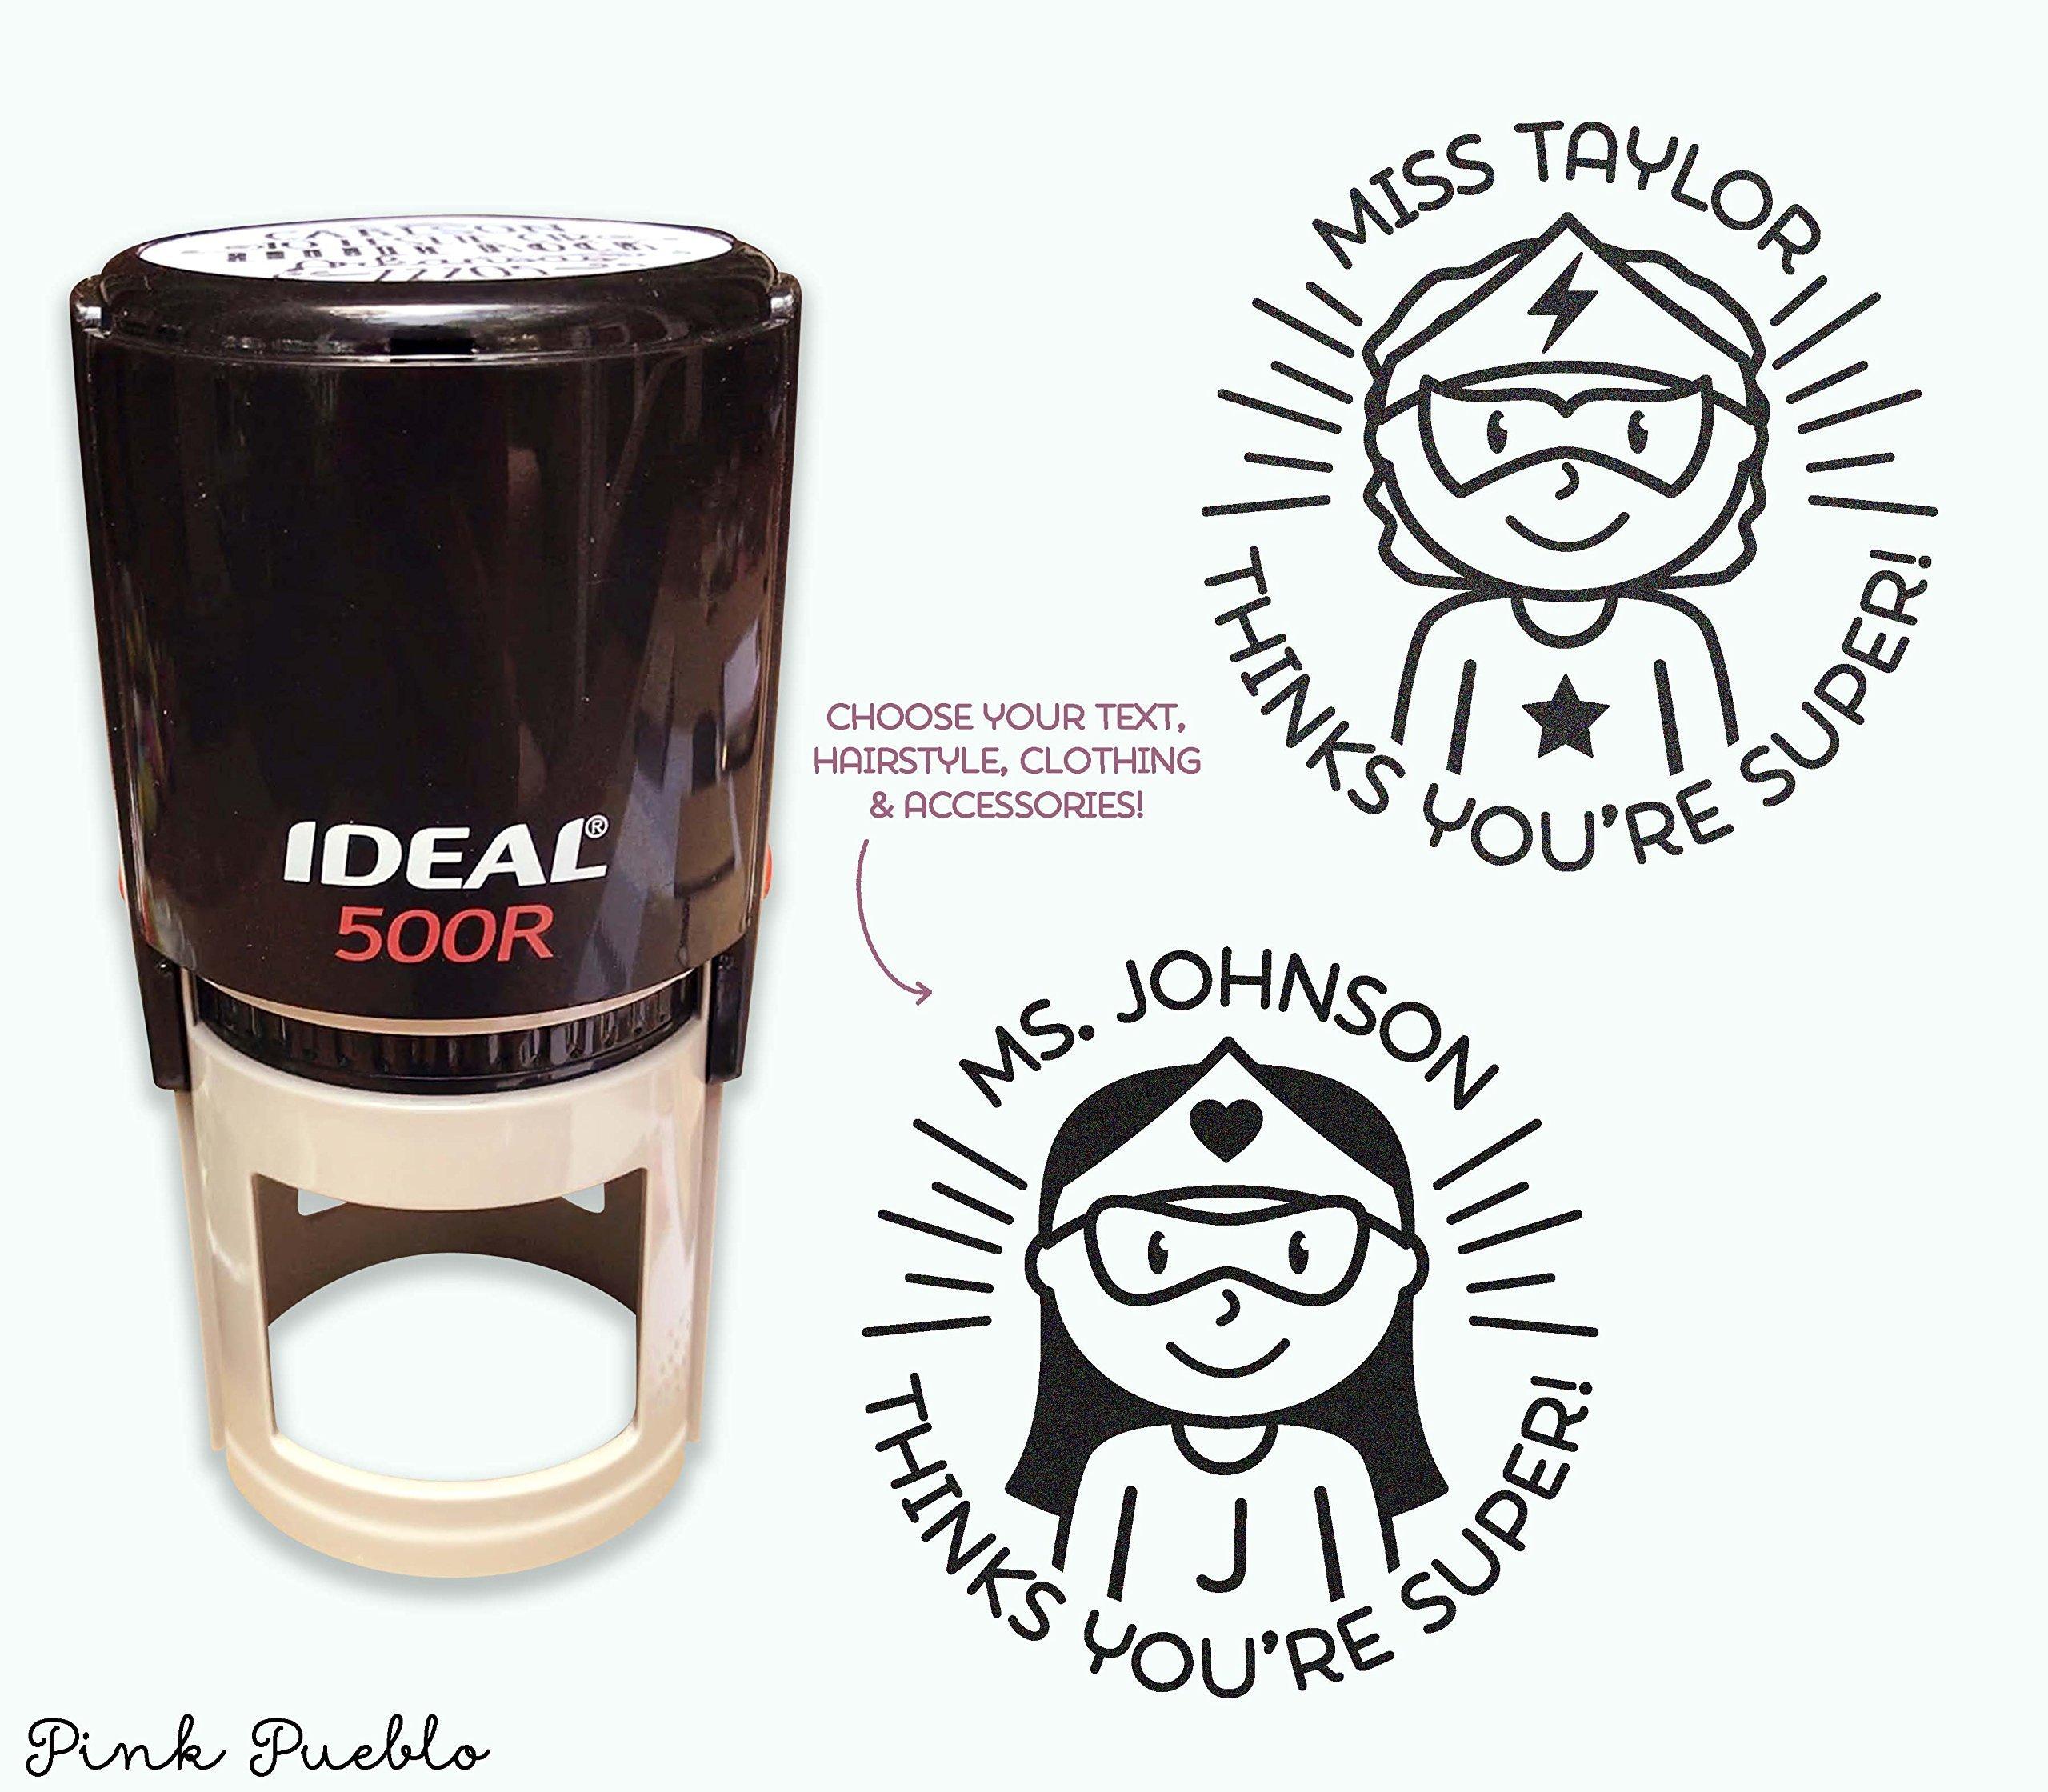 Self Inking Superhero Teacher Stamp, Personalized Superhero Teacher Stamps, Teacher Gifts - Choose Hairstyle and Accessories